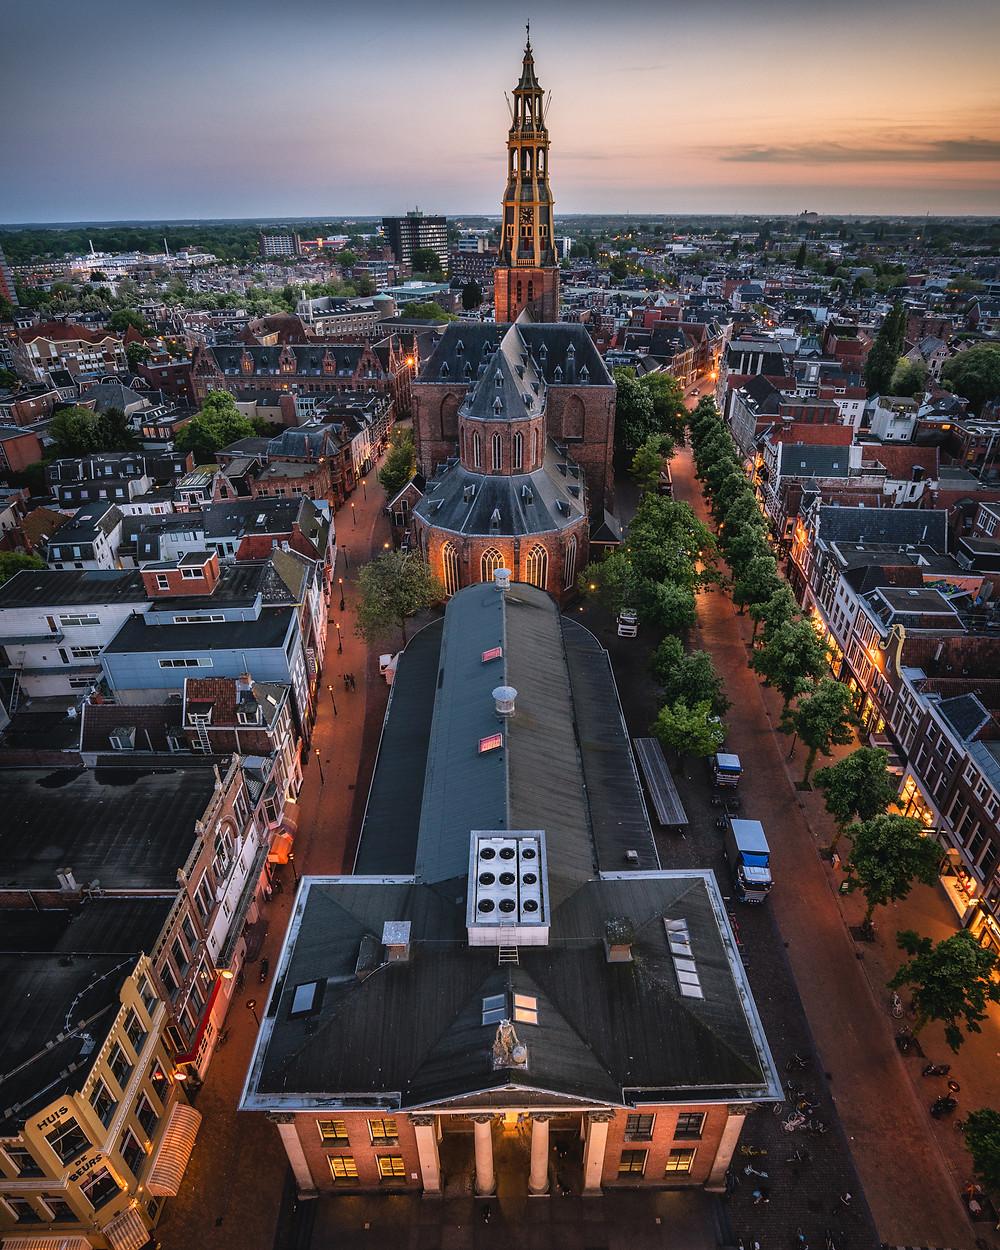 De A-Kerk, Korenbeurs, Vismarkt, Groningen